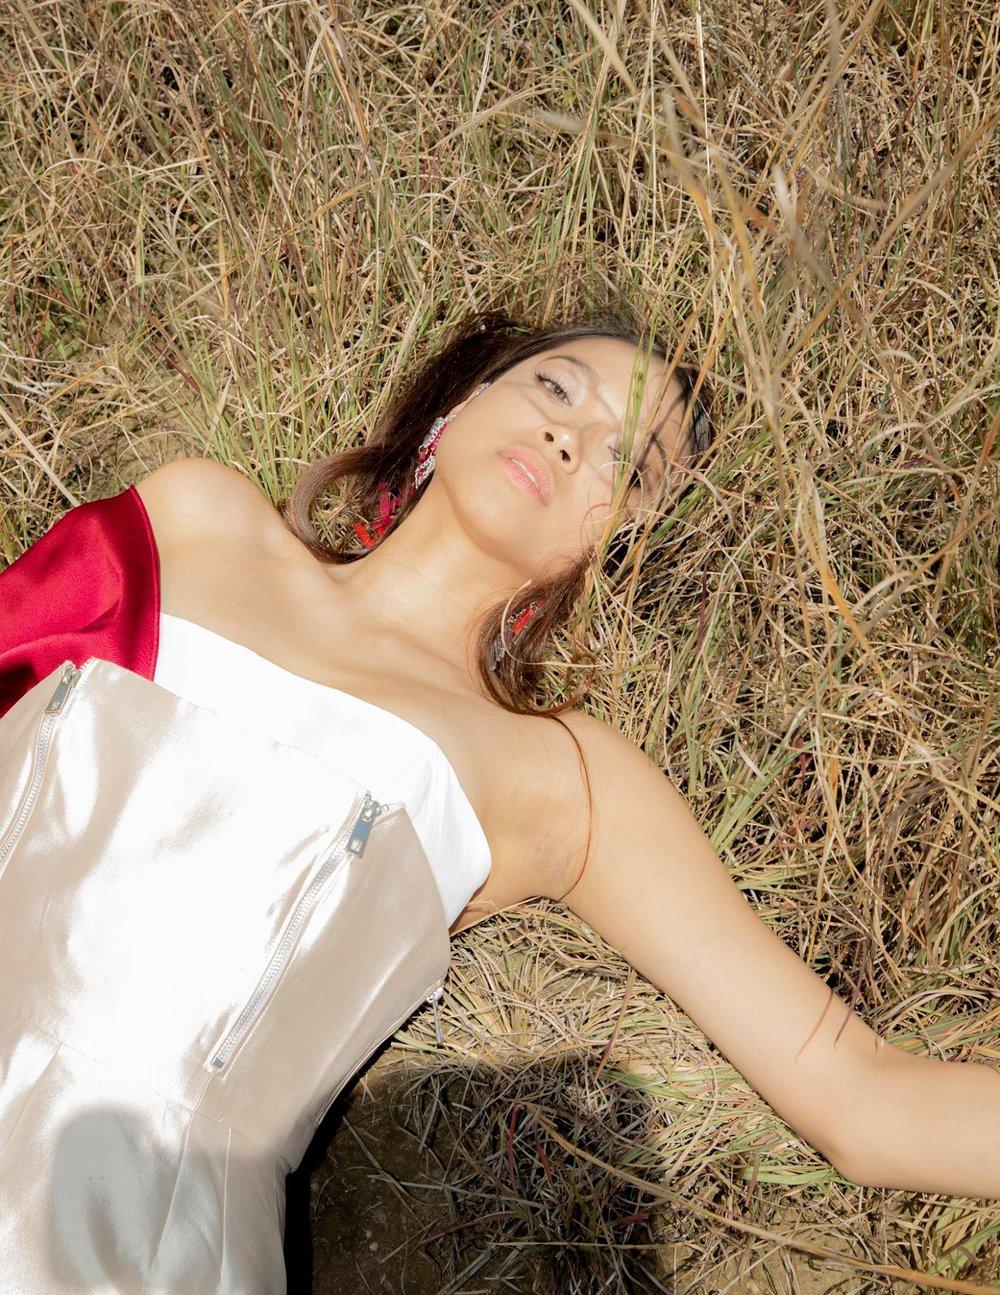 KATHERINE VASQUEZ SENIOR COLLECTION  Model: Gabrielle Malate  Photographer: Augusto Silva